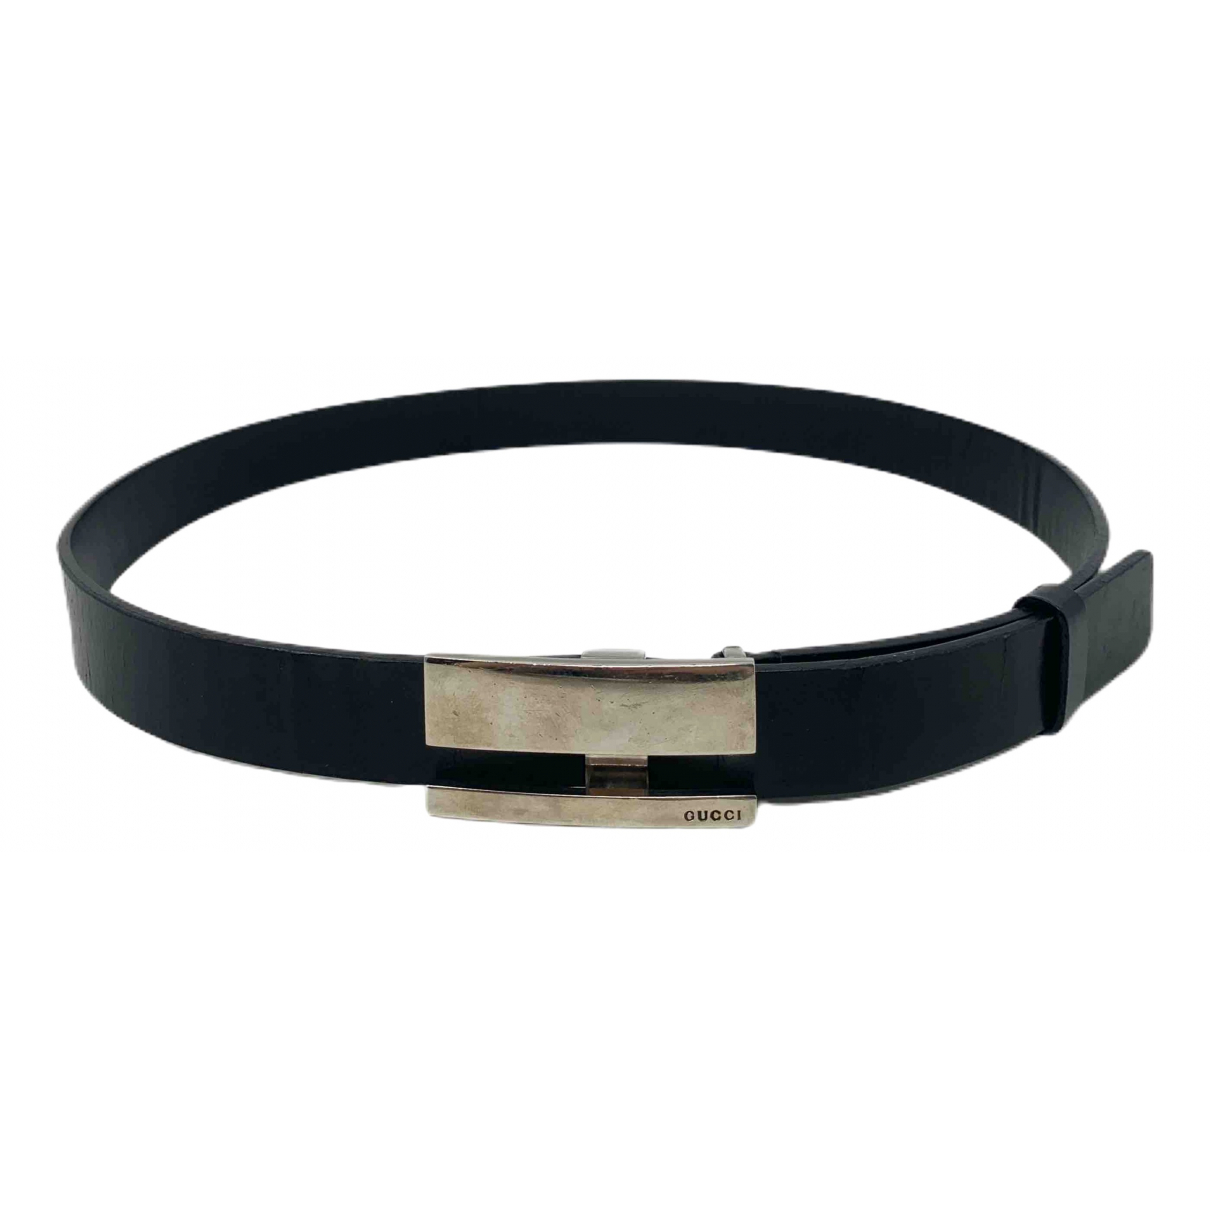 Gucci \N Black Leather belt for Women M International